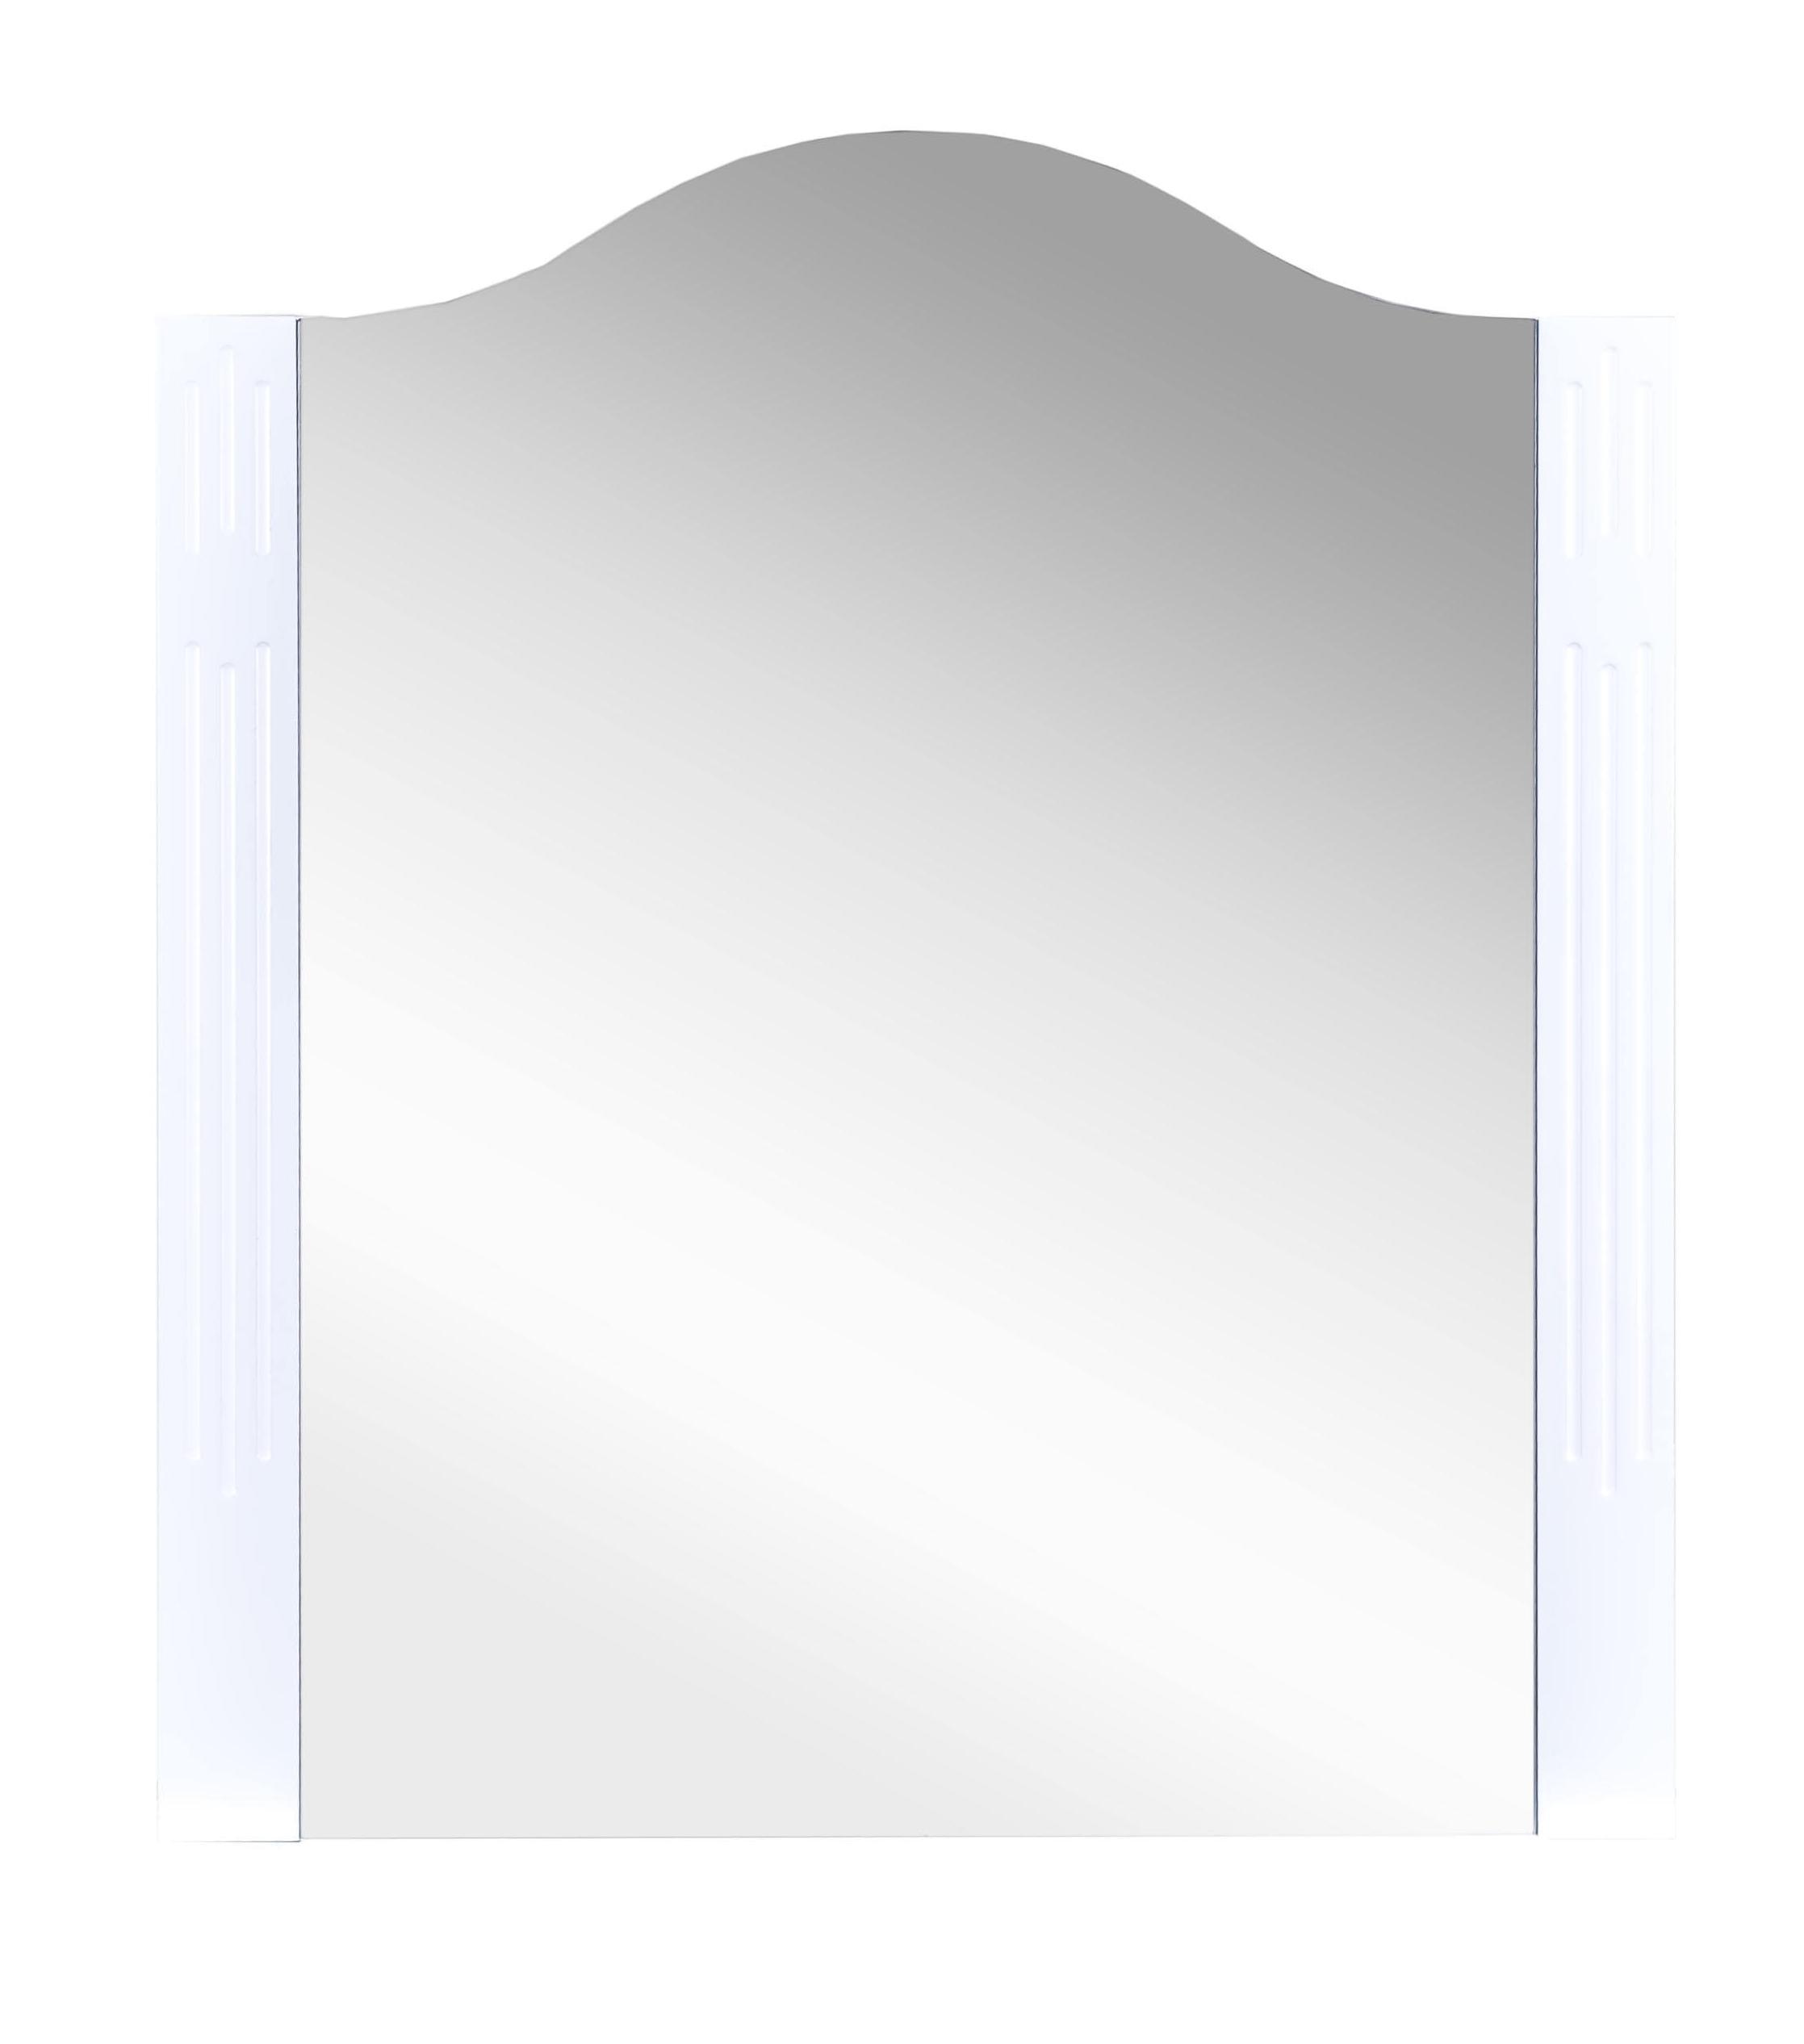 Зеркало Аква Родос Классик 2019 65 см